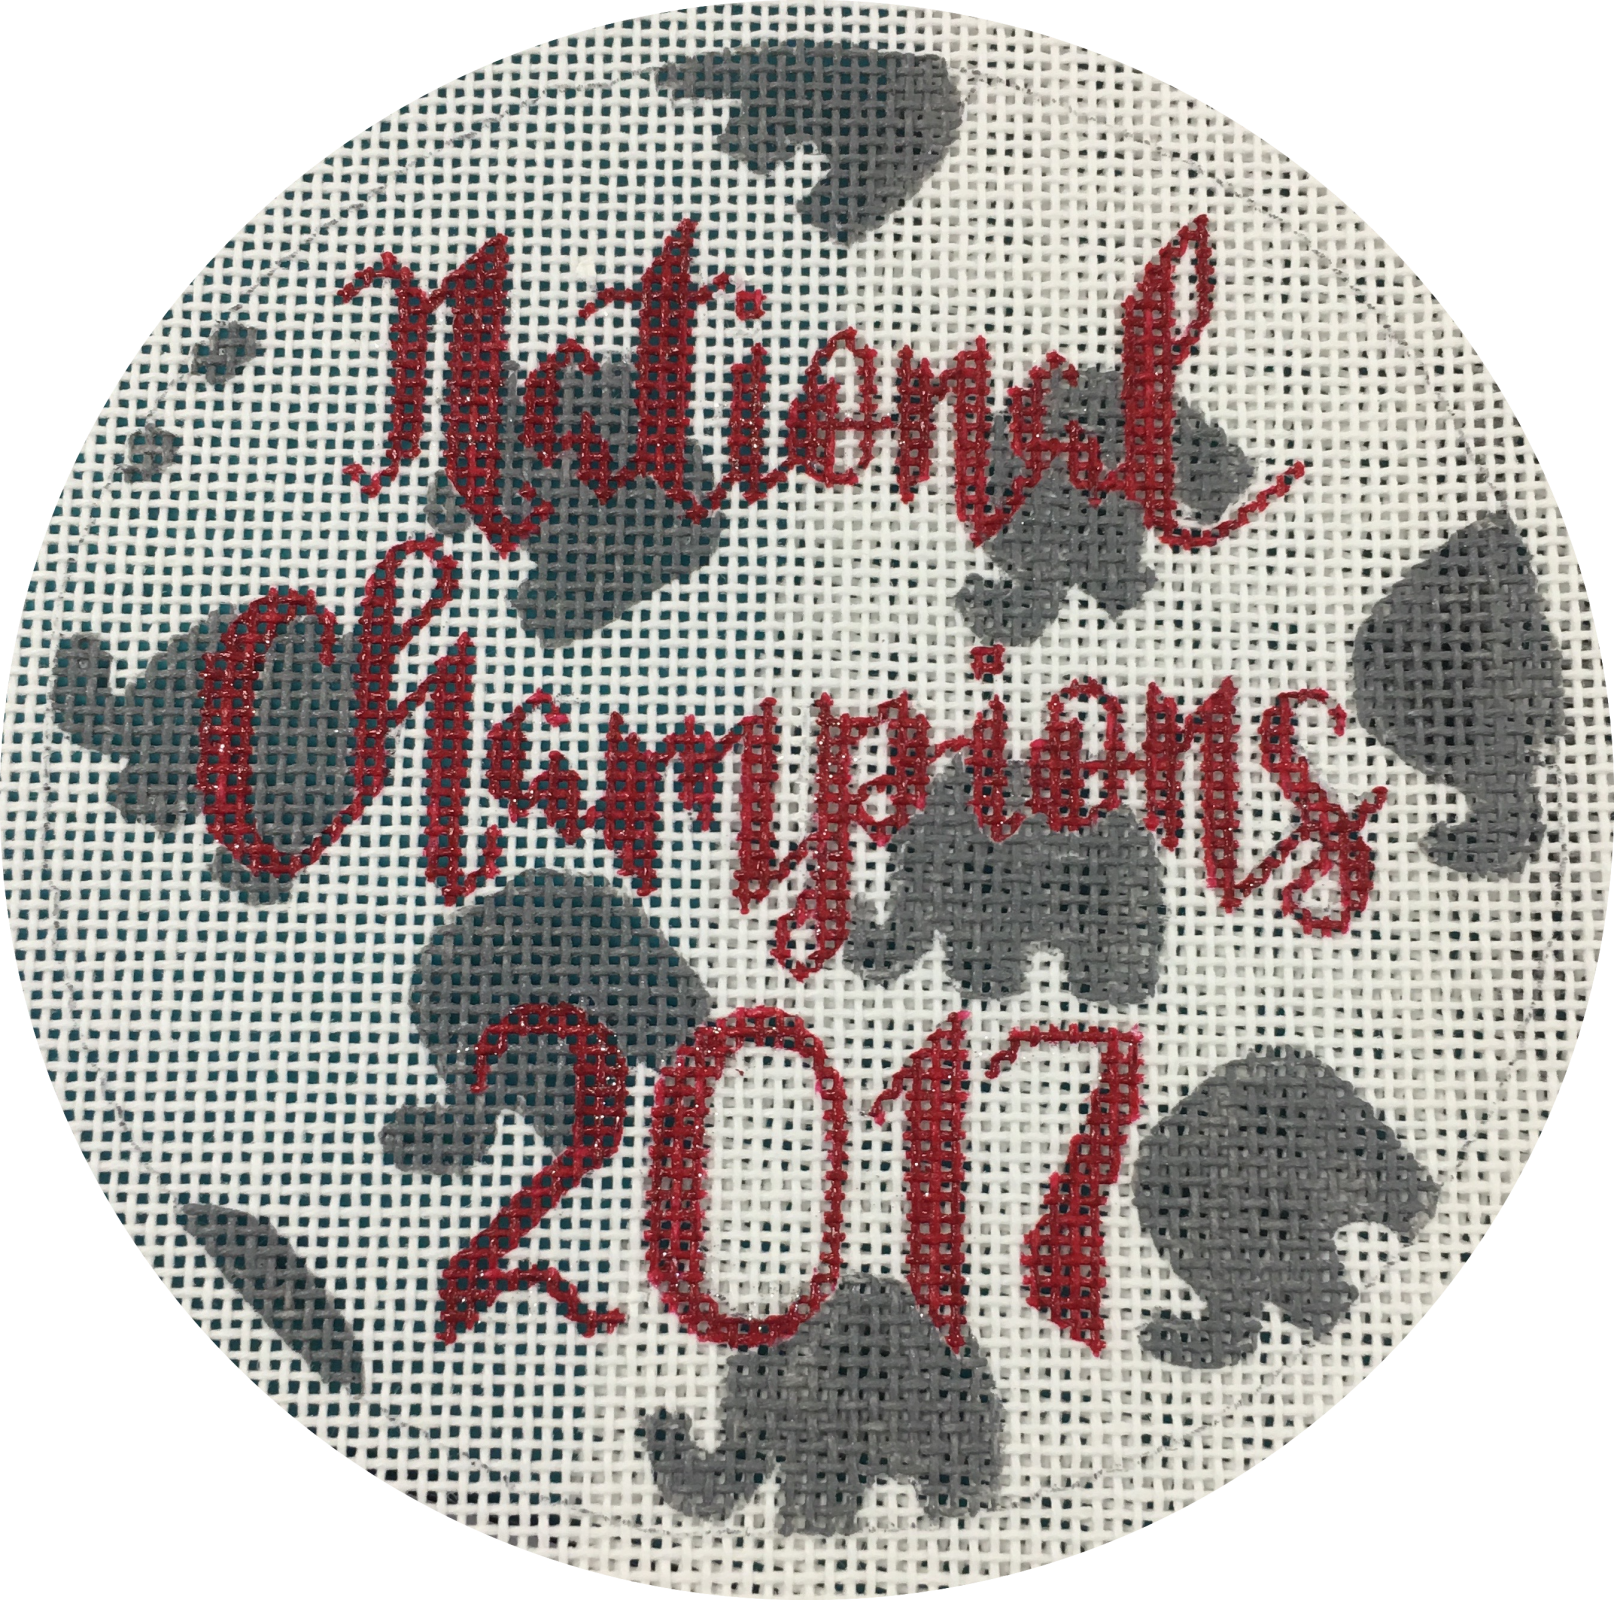 2017 national champions